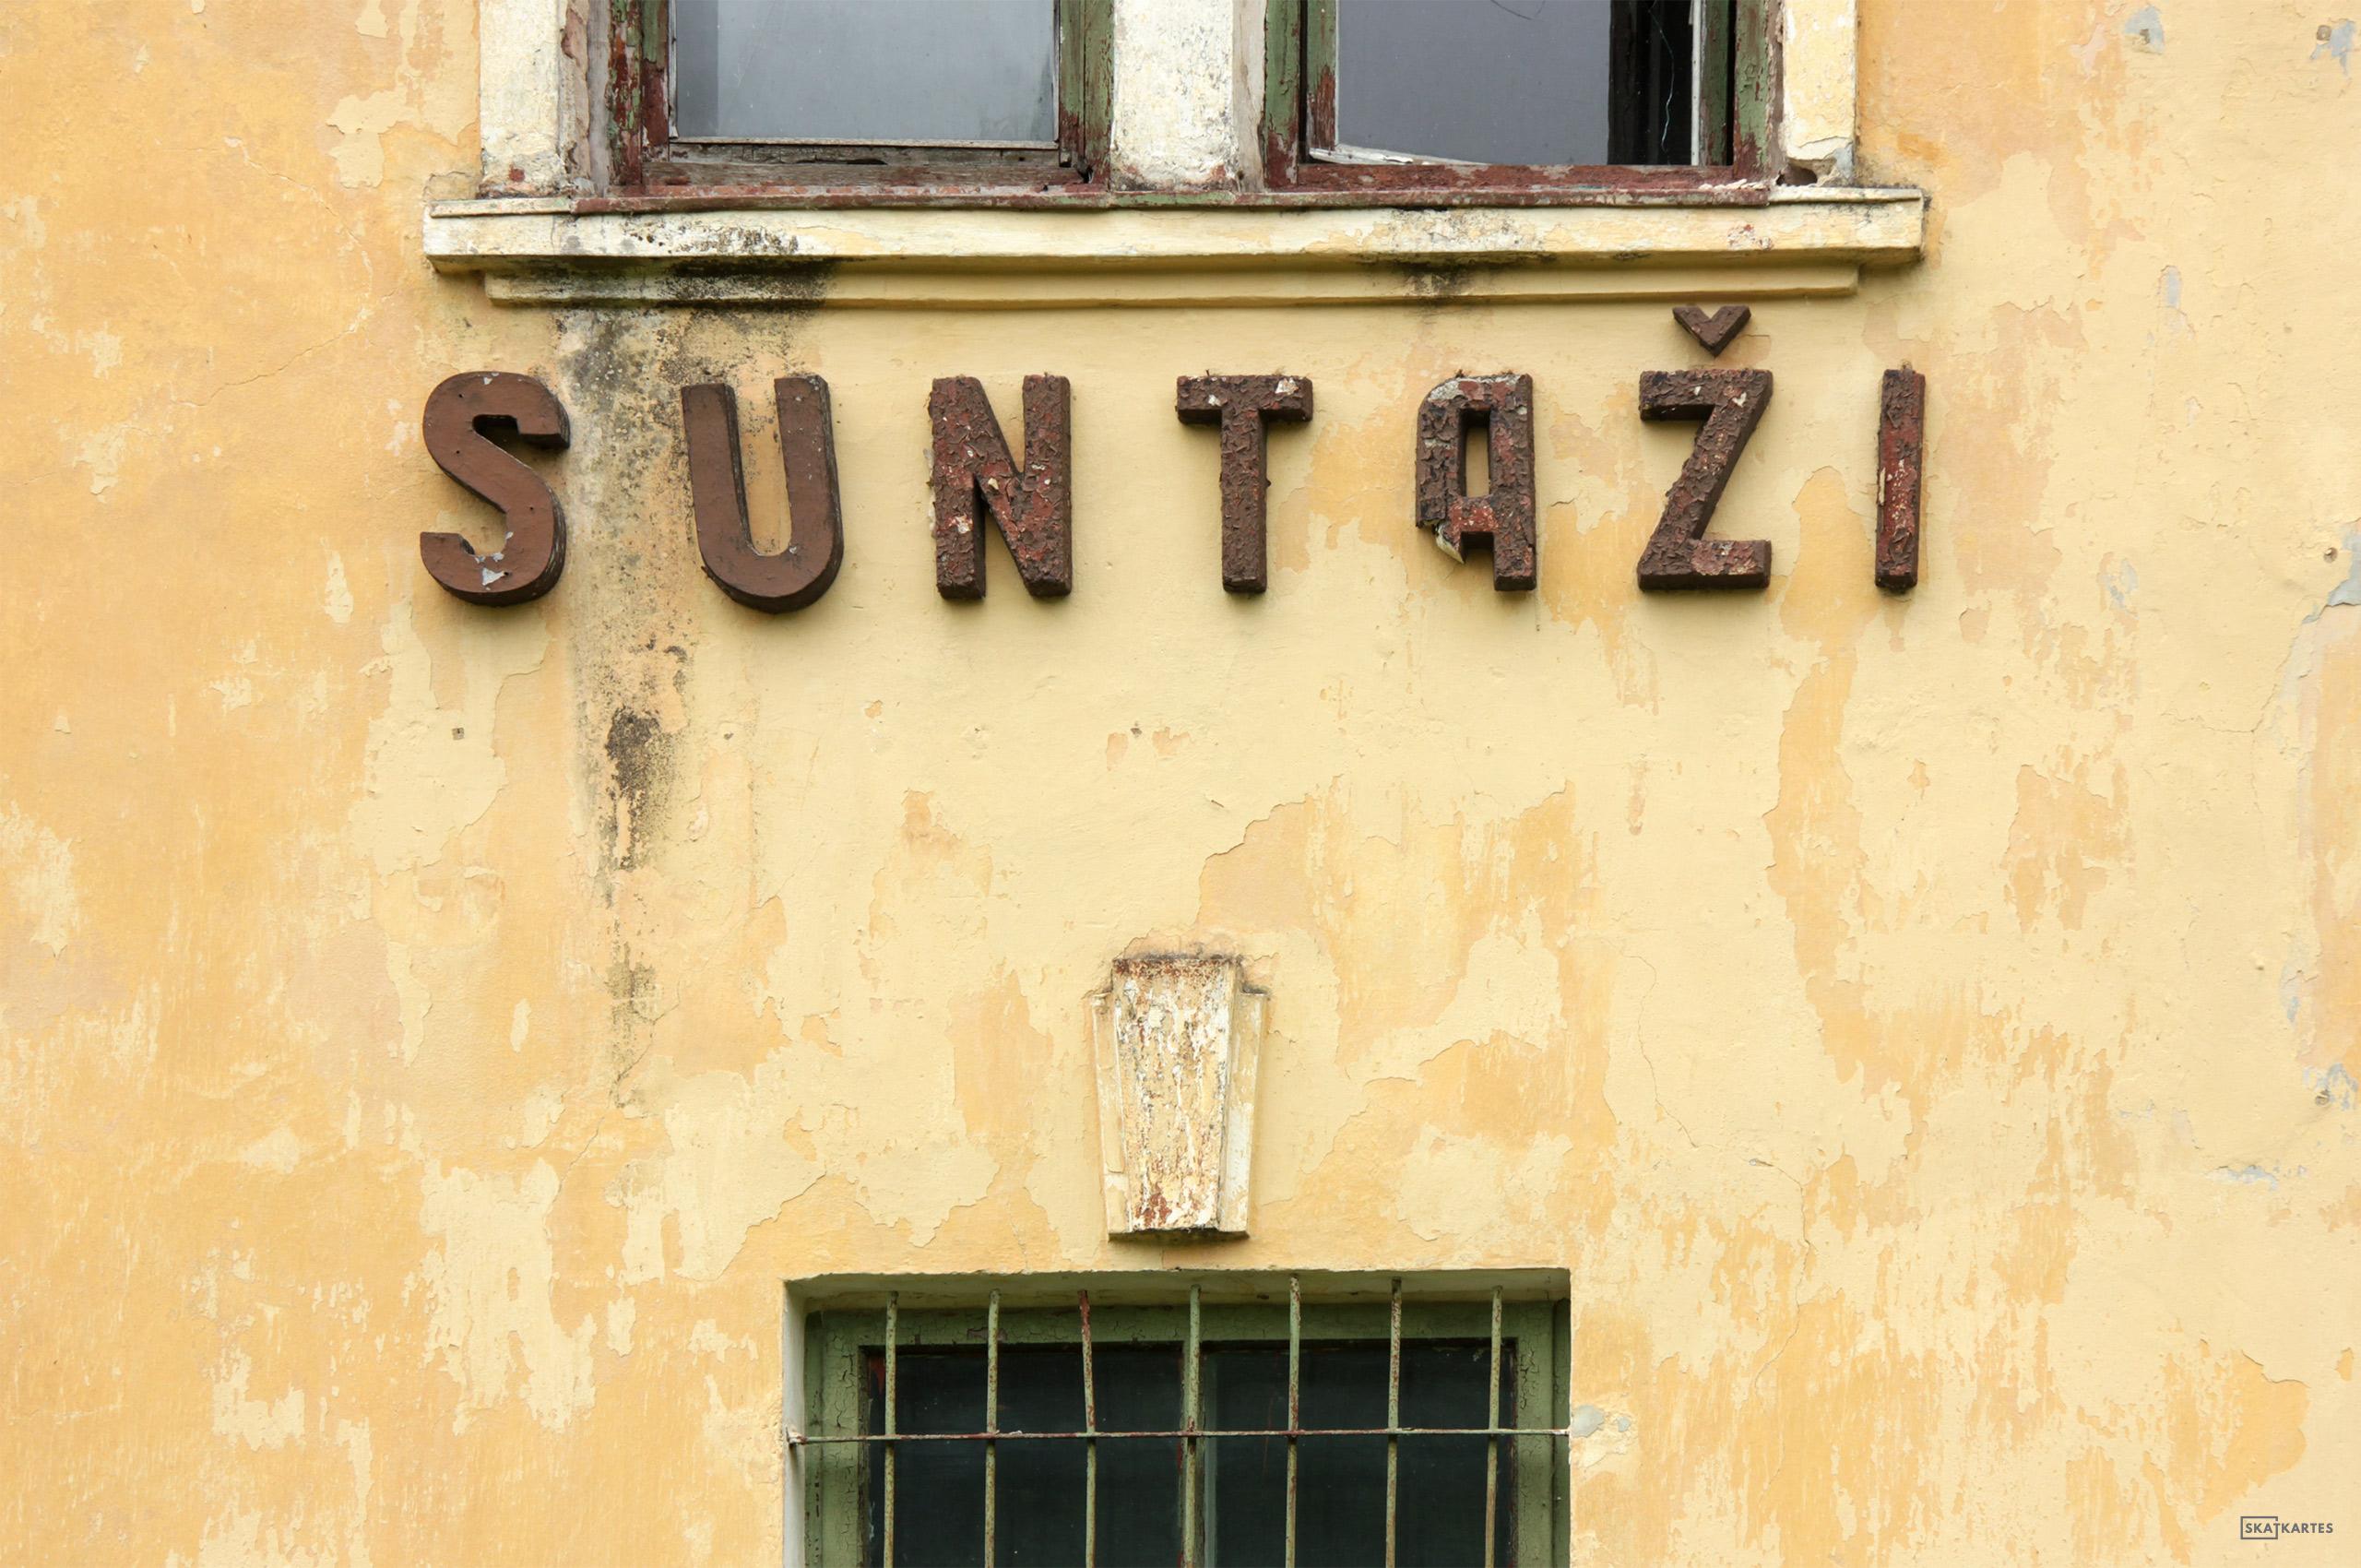 Skatkartes-Latvija-Rigas-regions-Ogres-novads-Suntazi-2015